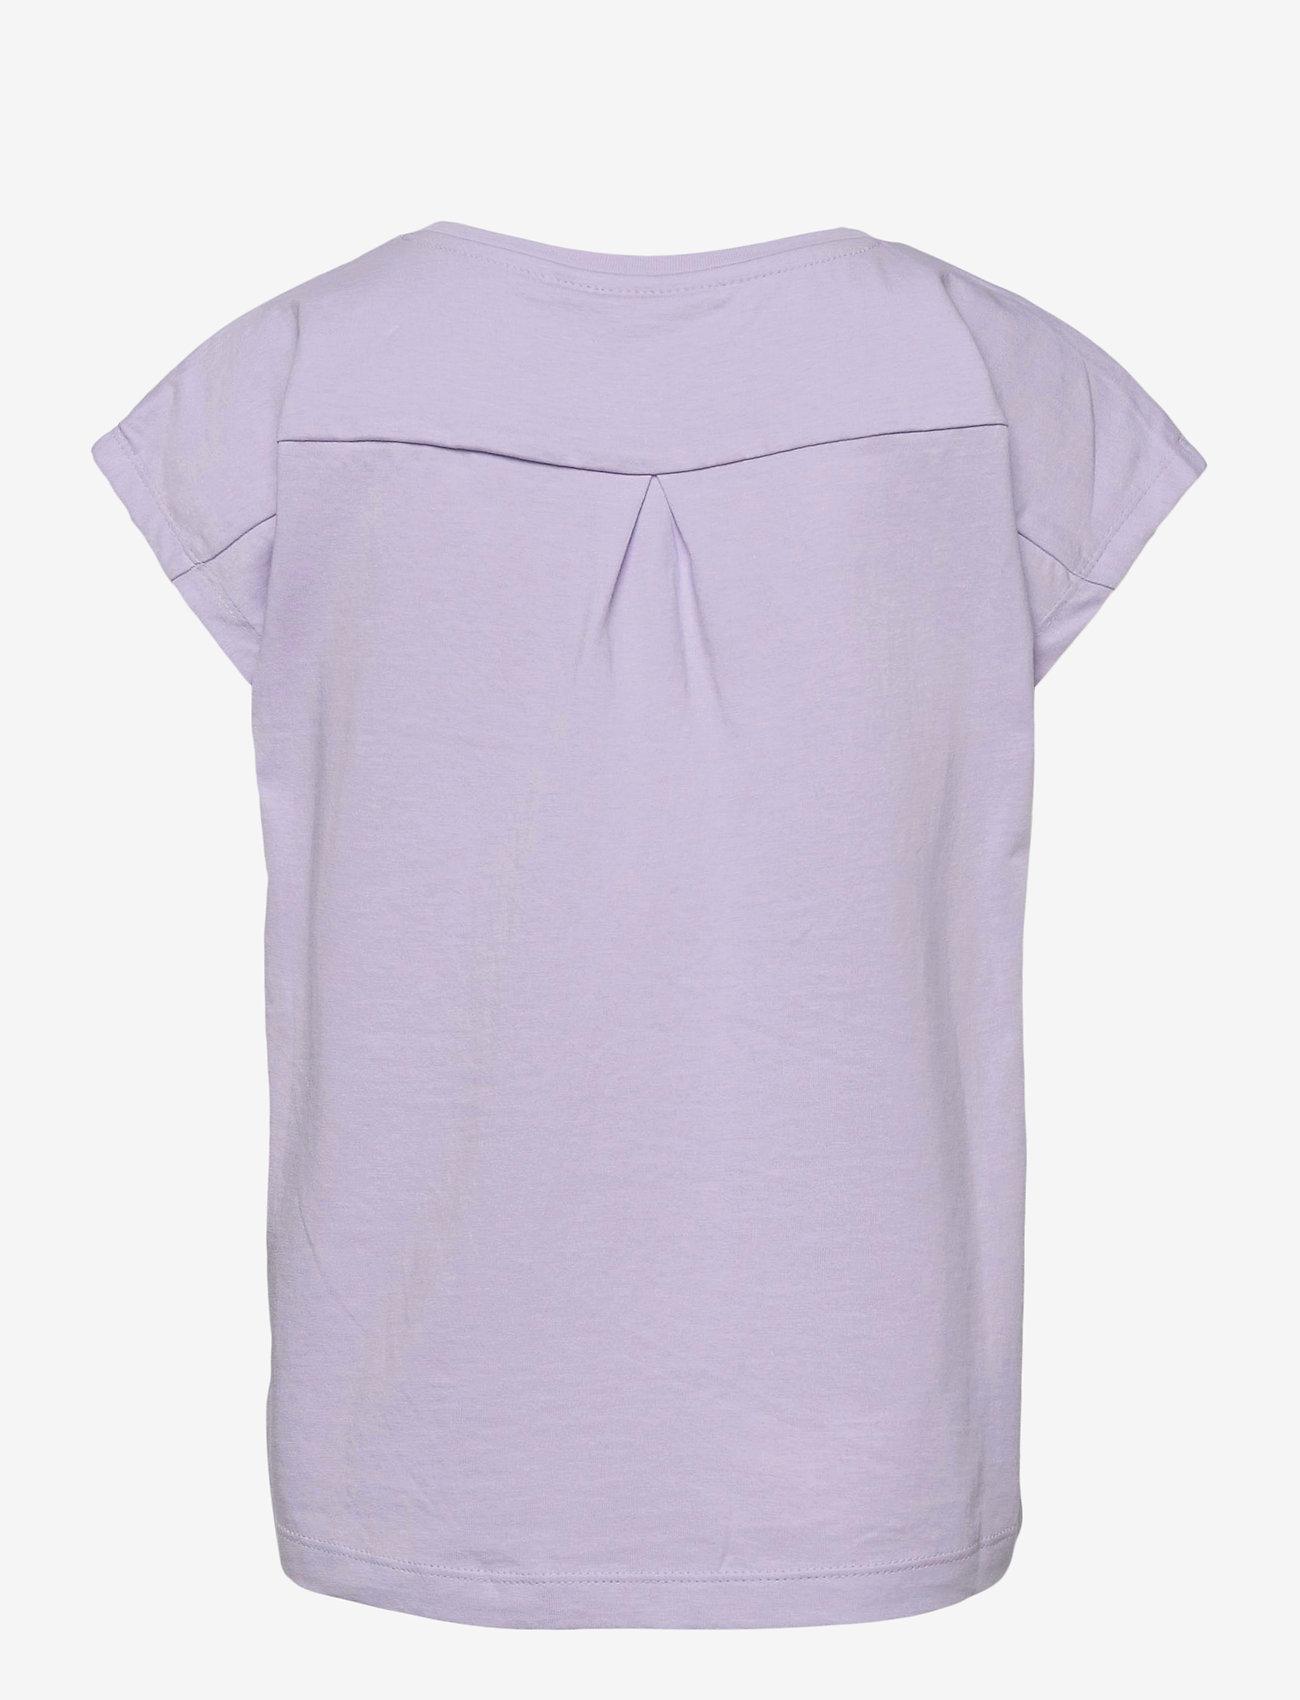 Hummel - hmlDIEZ T-SHIRT S/S - short-sleeved - pastel lilac - 1